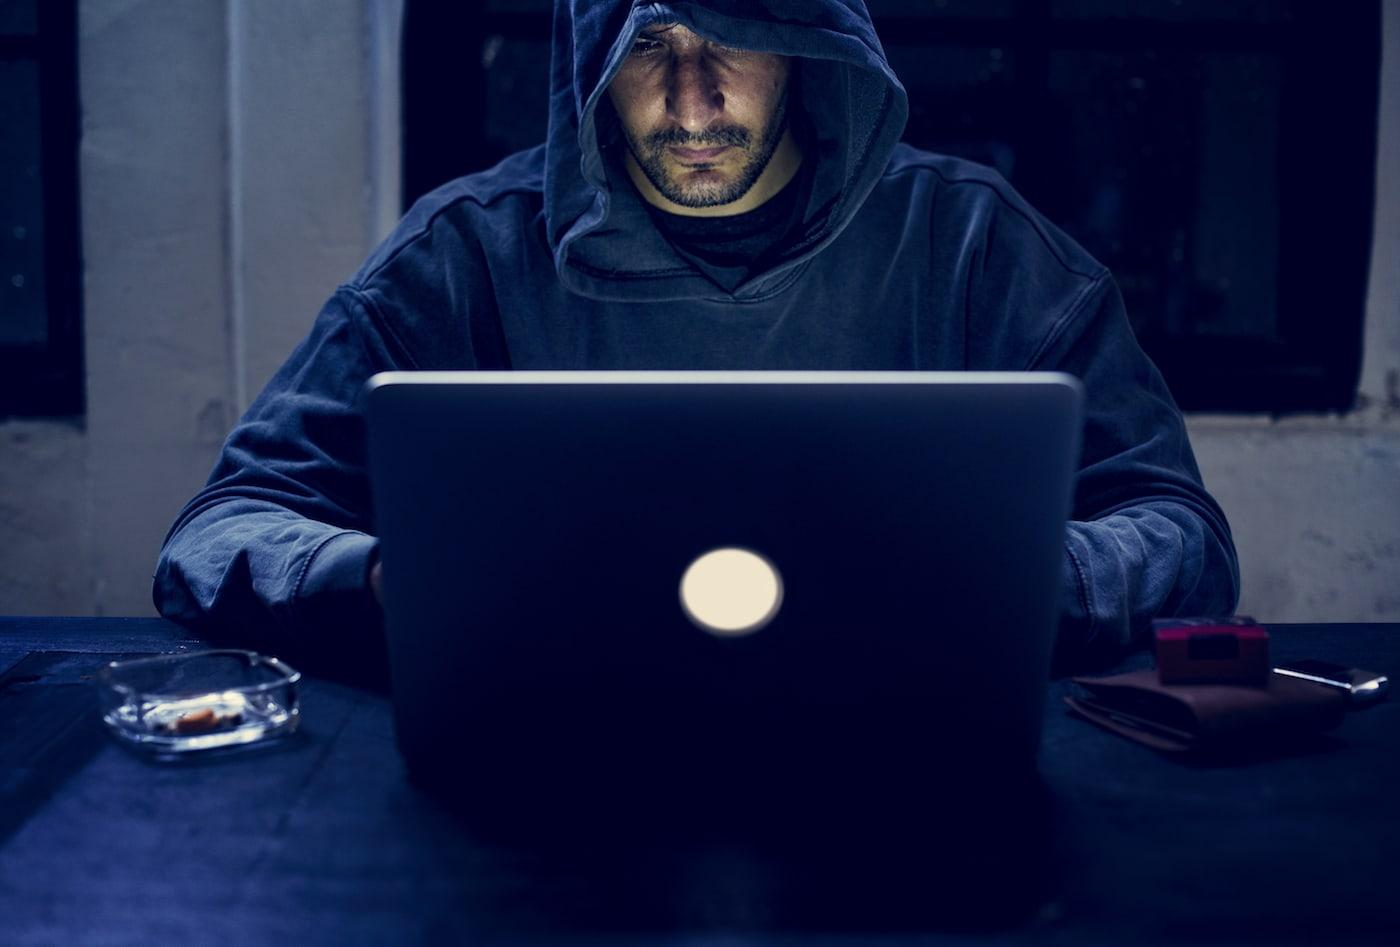 Kriminelle im Internet